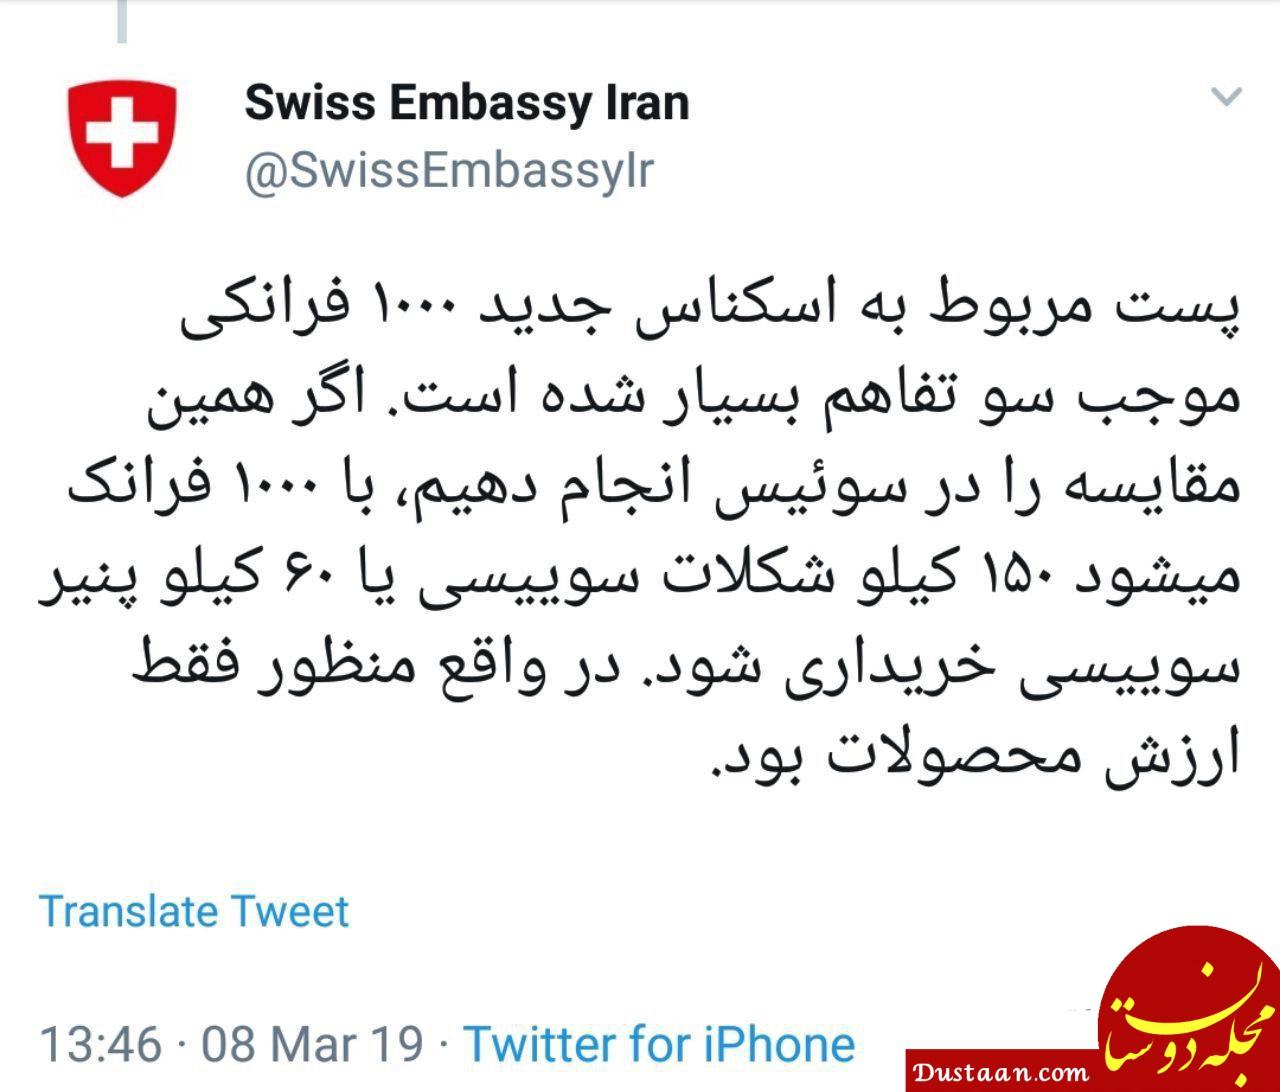 www.dustaan.com توضیح سفارت سوئیس درباره توئیتی که مخاطبان ایرانی آن را توهین آمیز دانستند